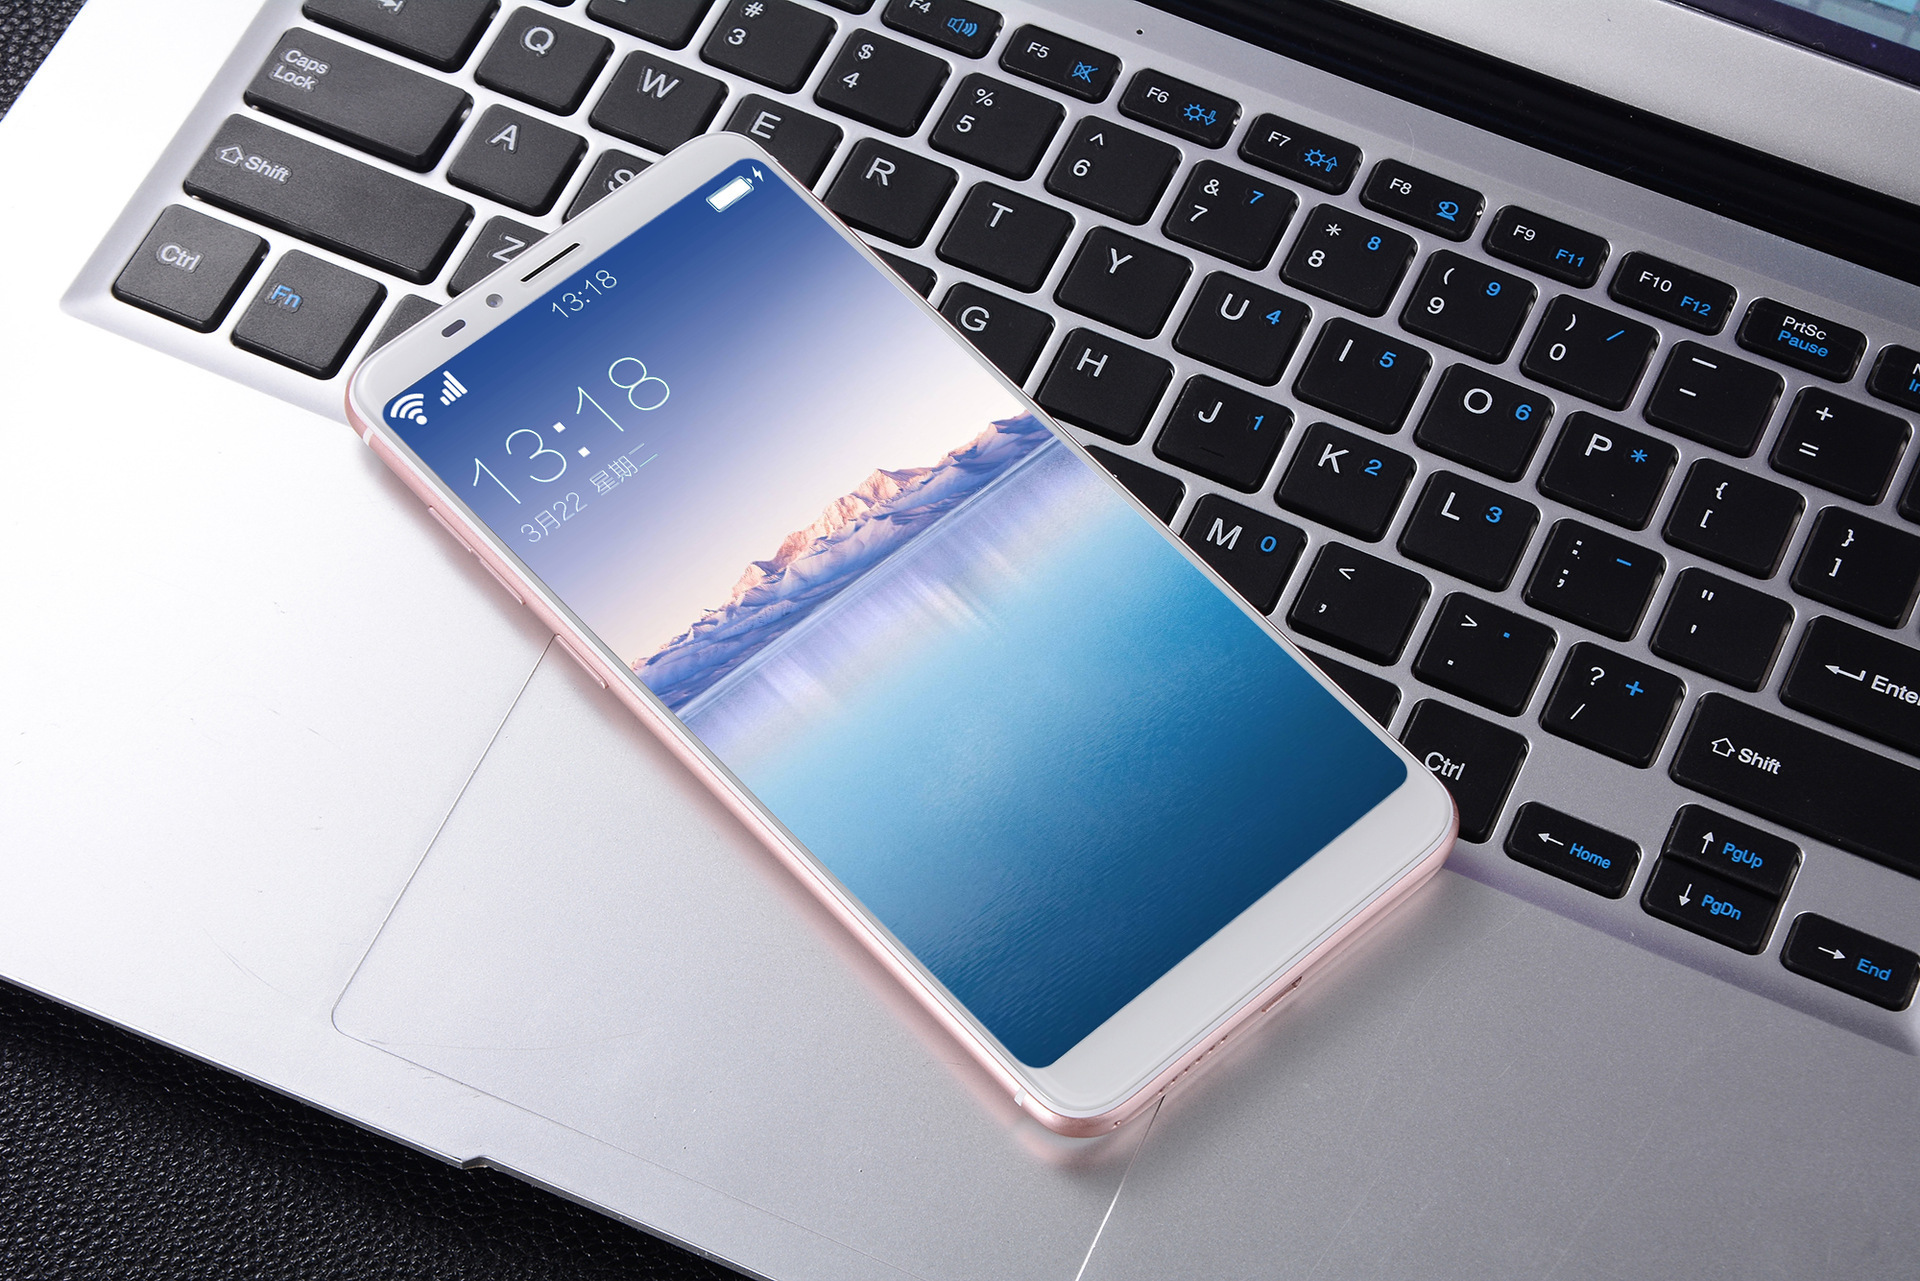 Screen Full Cnc 6g Function 6.5 Inch 18:9 Ten Kernel Fingerprint Security Zhuo Face Unlocking Intelligence Telecom Mobile Phone